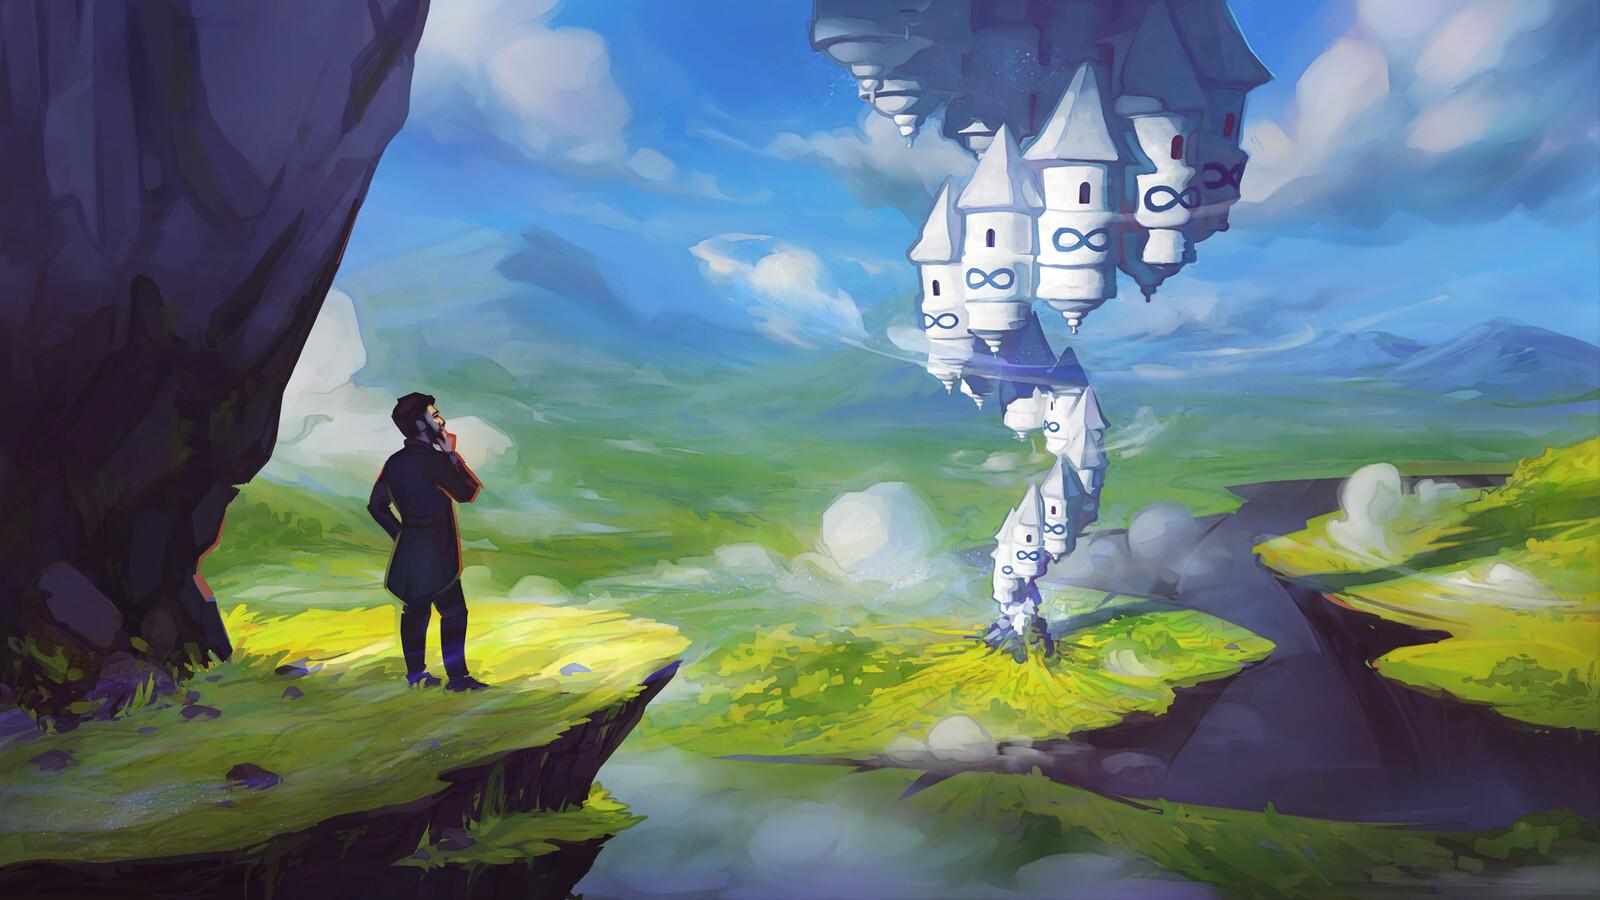 Tower of Infinities • Math / Fantasy Illustration